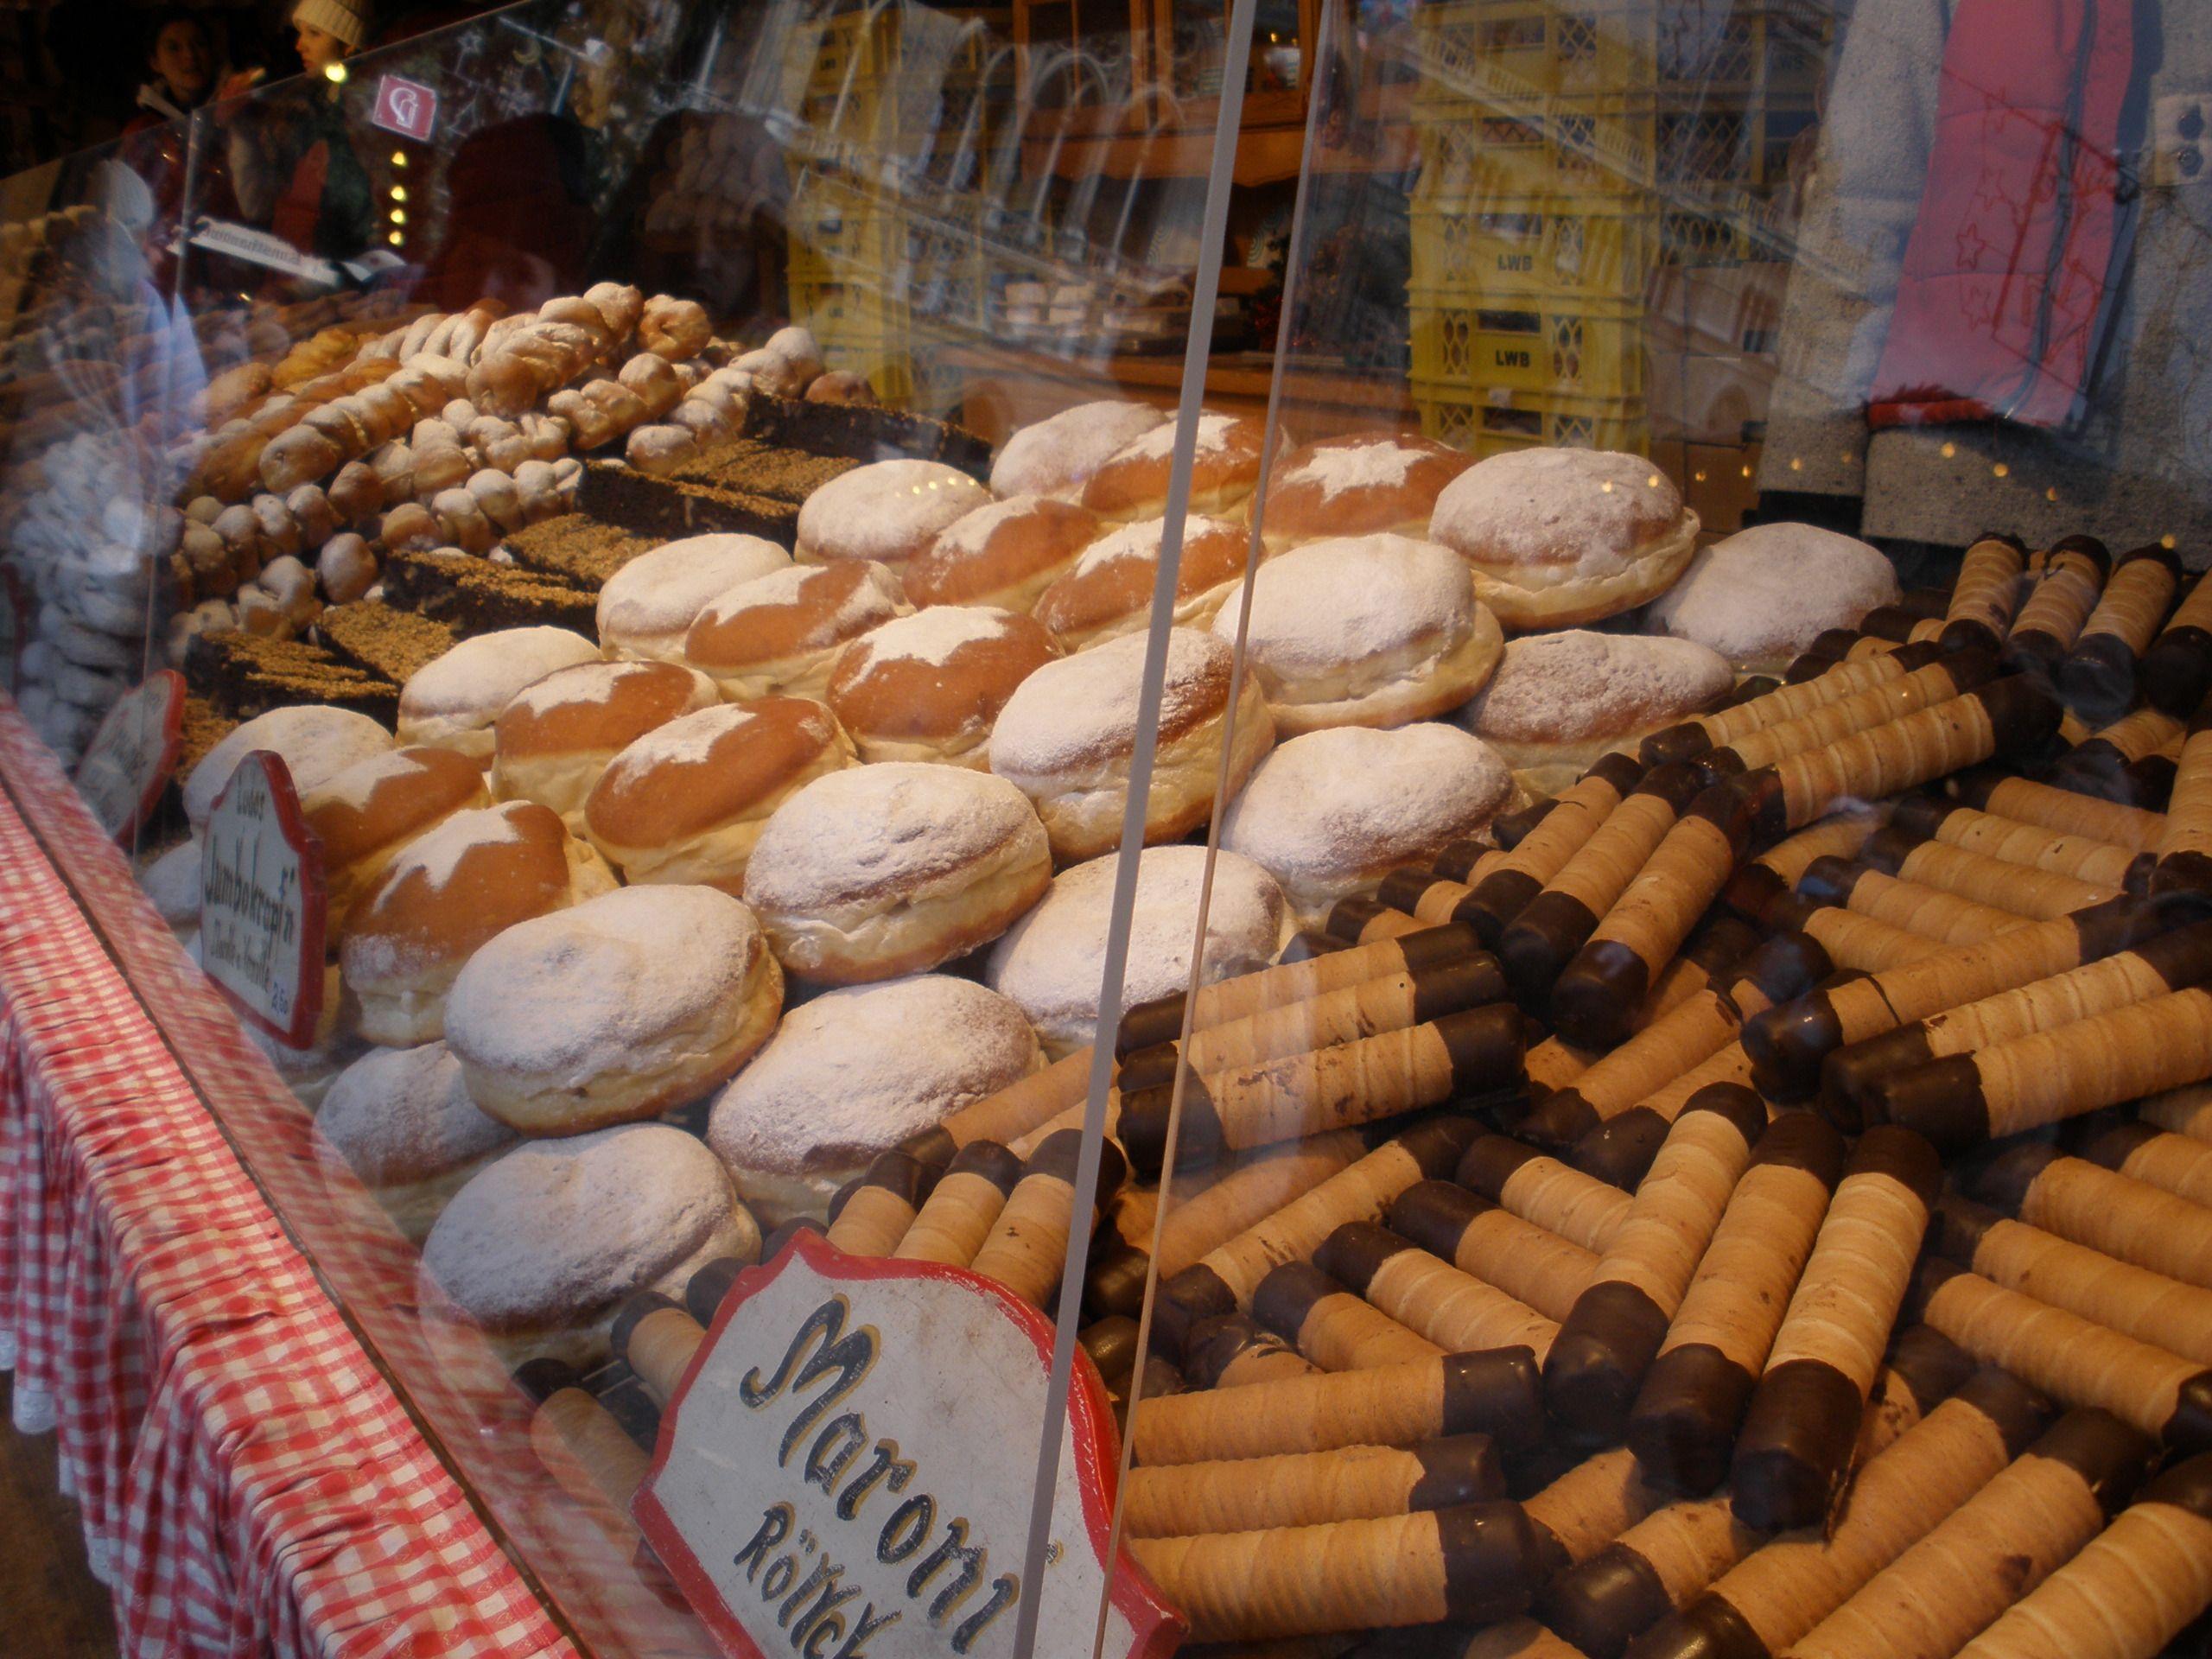 salzburg christmas market food Google Search Salzburg